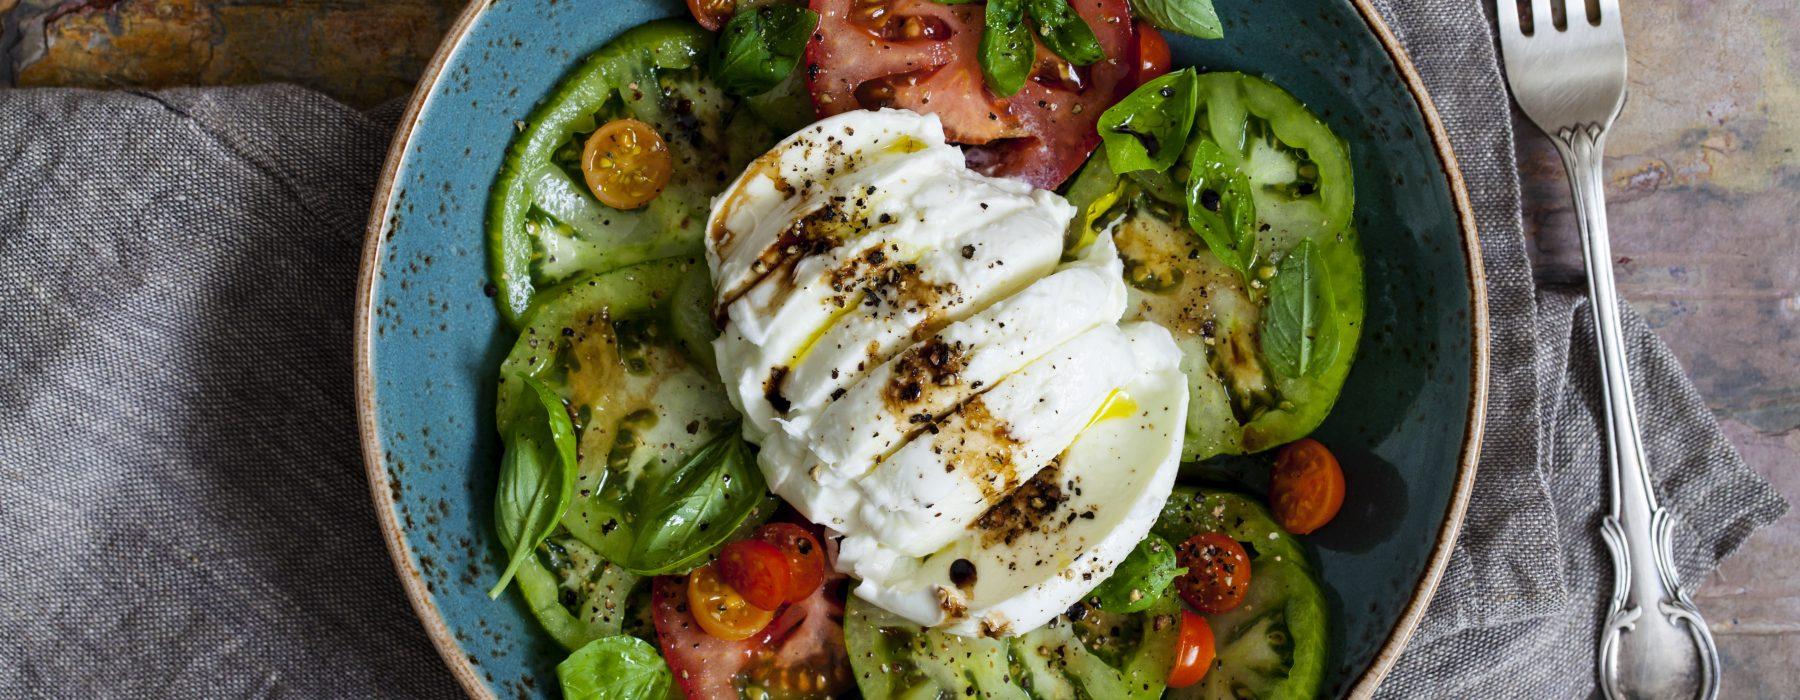 Simple Tomato, Basil & Buffalo Mozzarella Salad